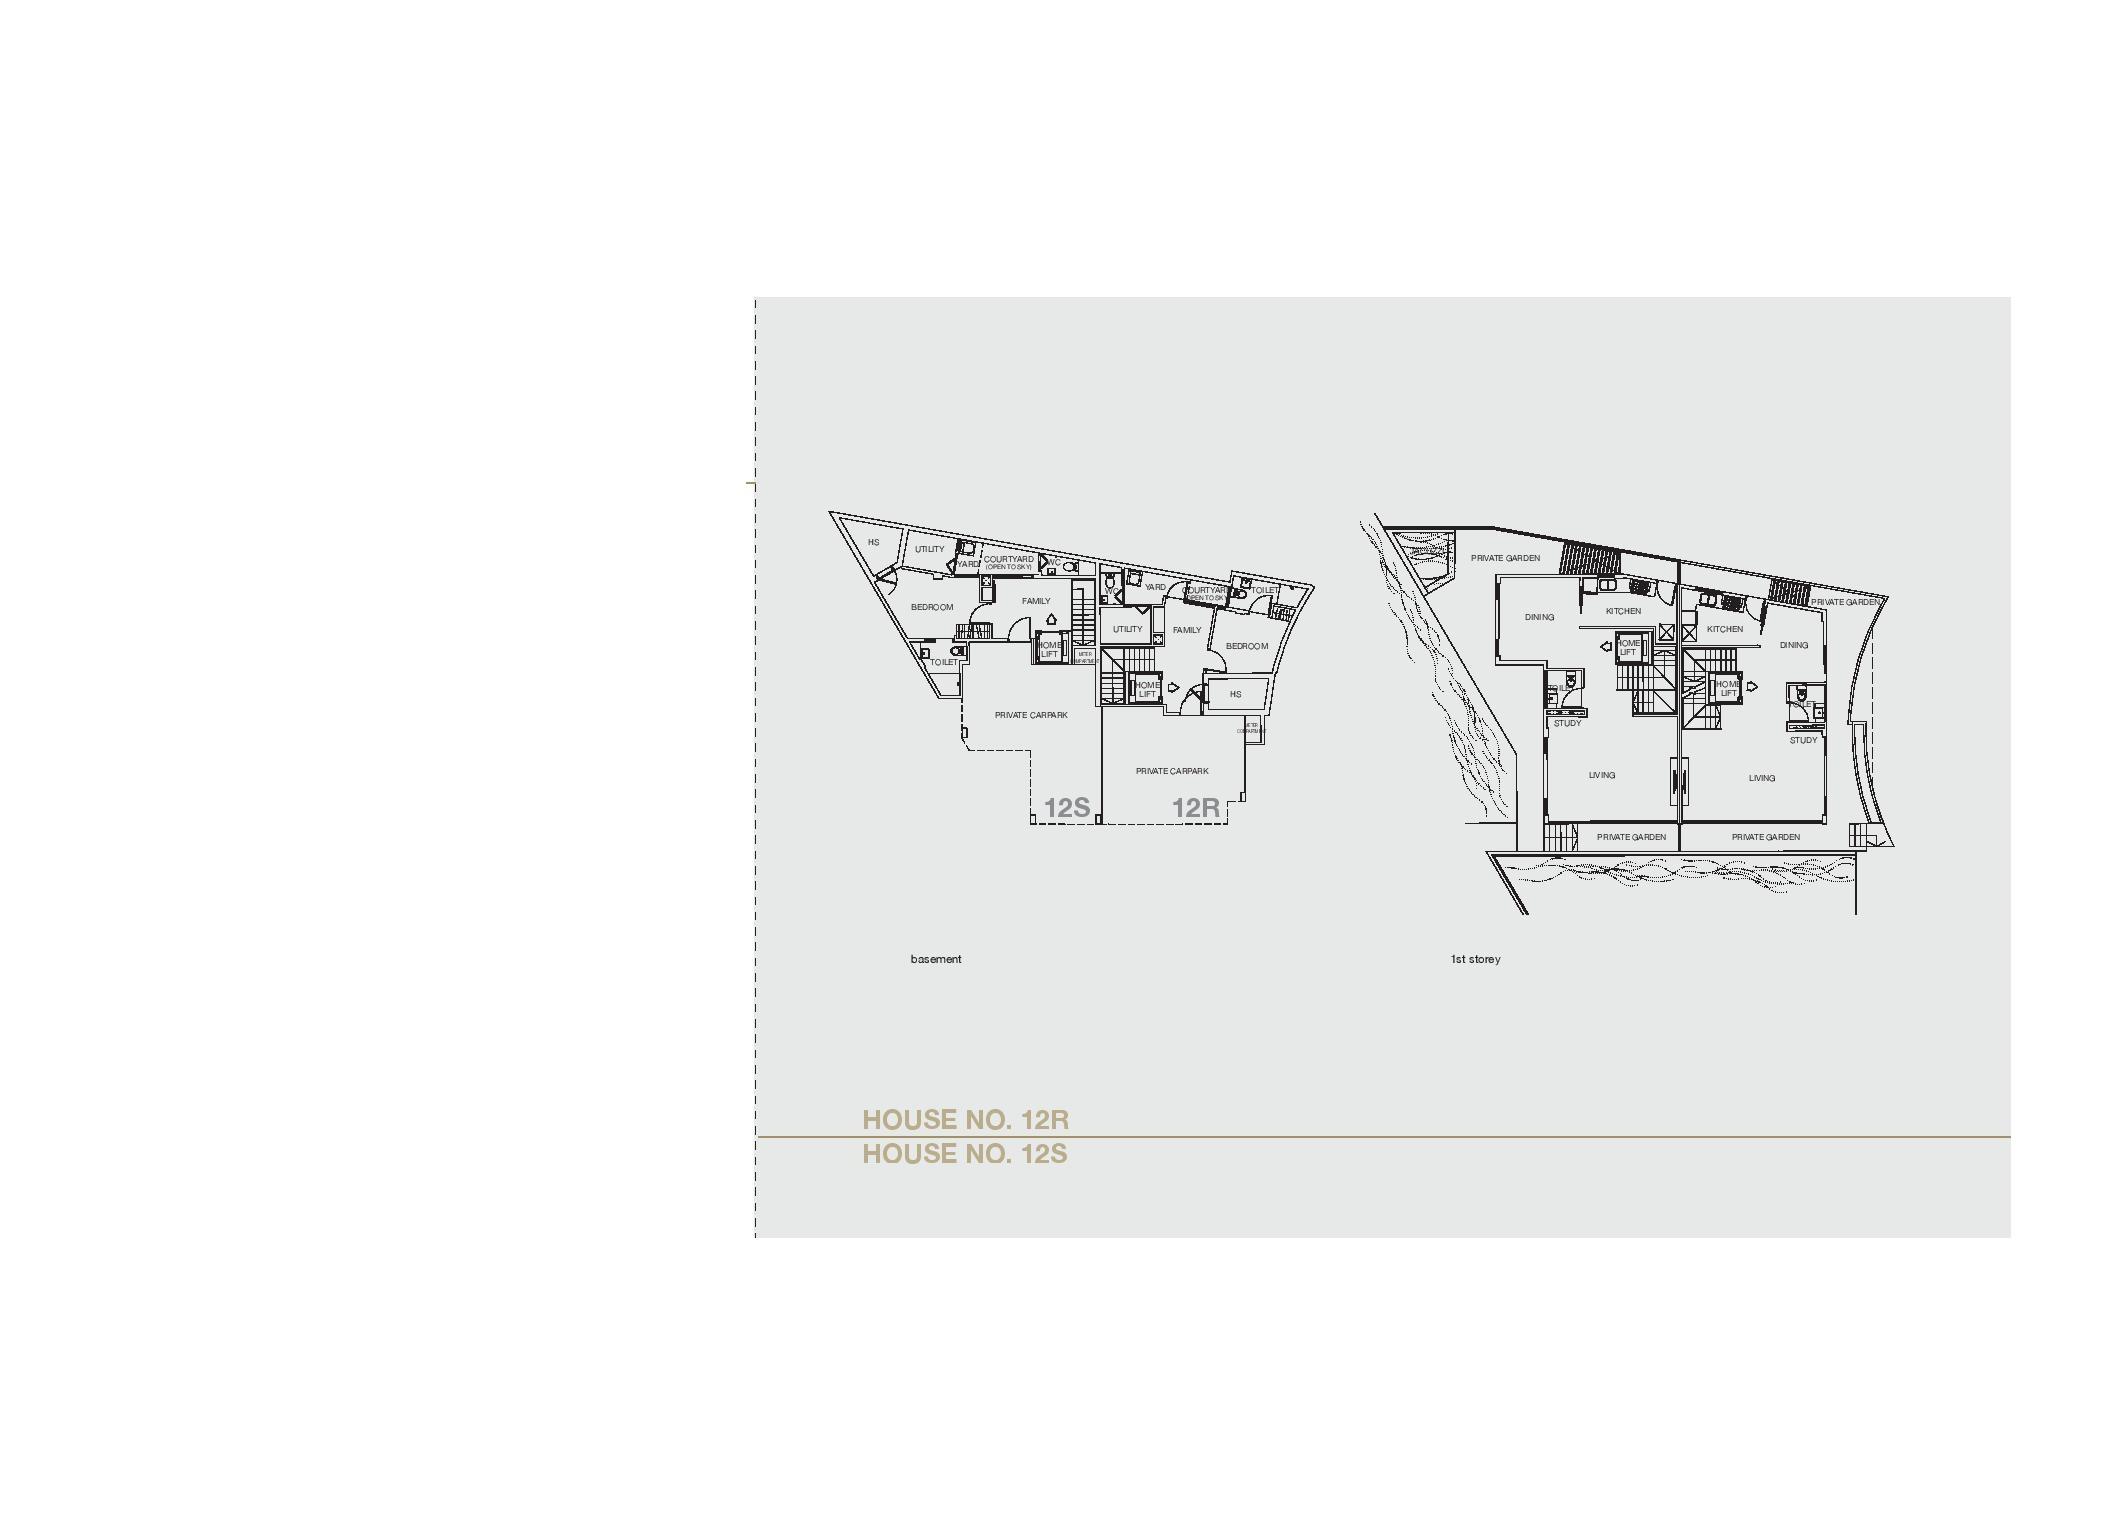 Chancery Hill Villas House 12R/12S Basement & 1st LevelFloor Plans